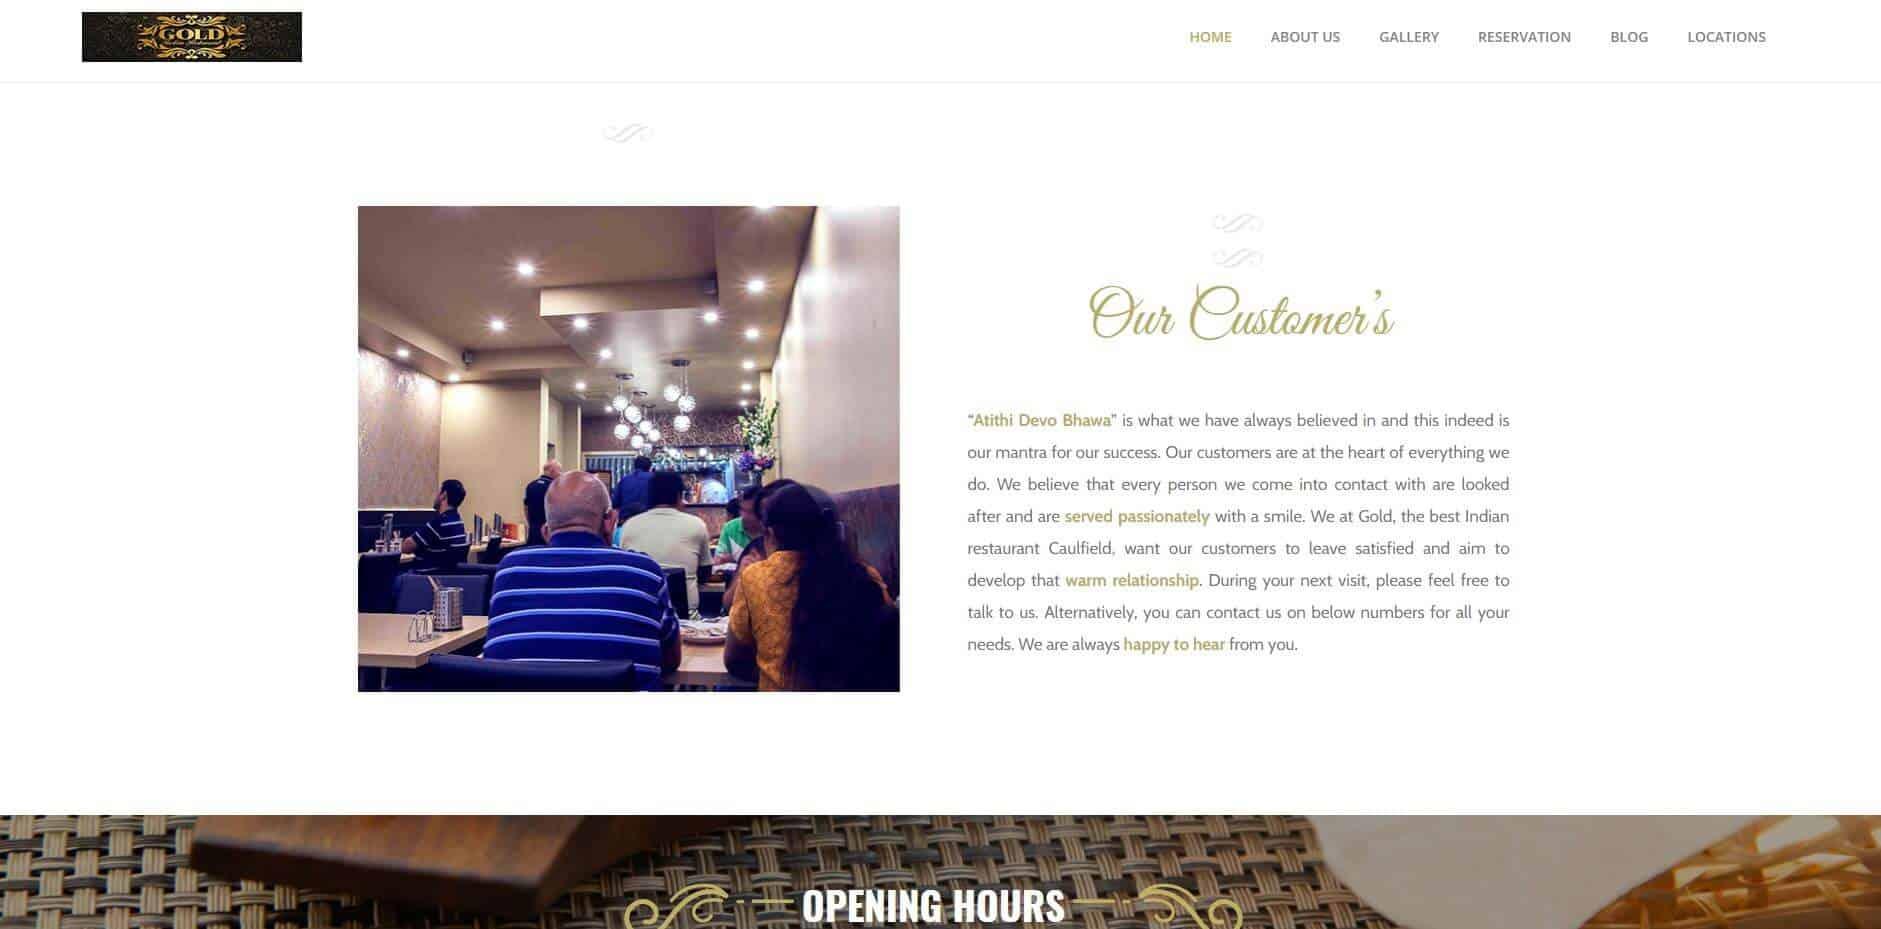 Gold Restaurant